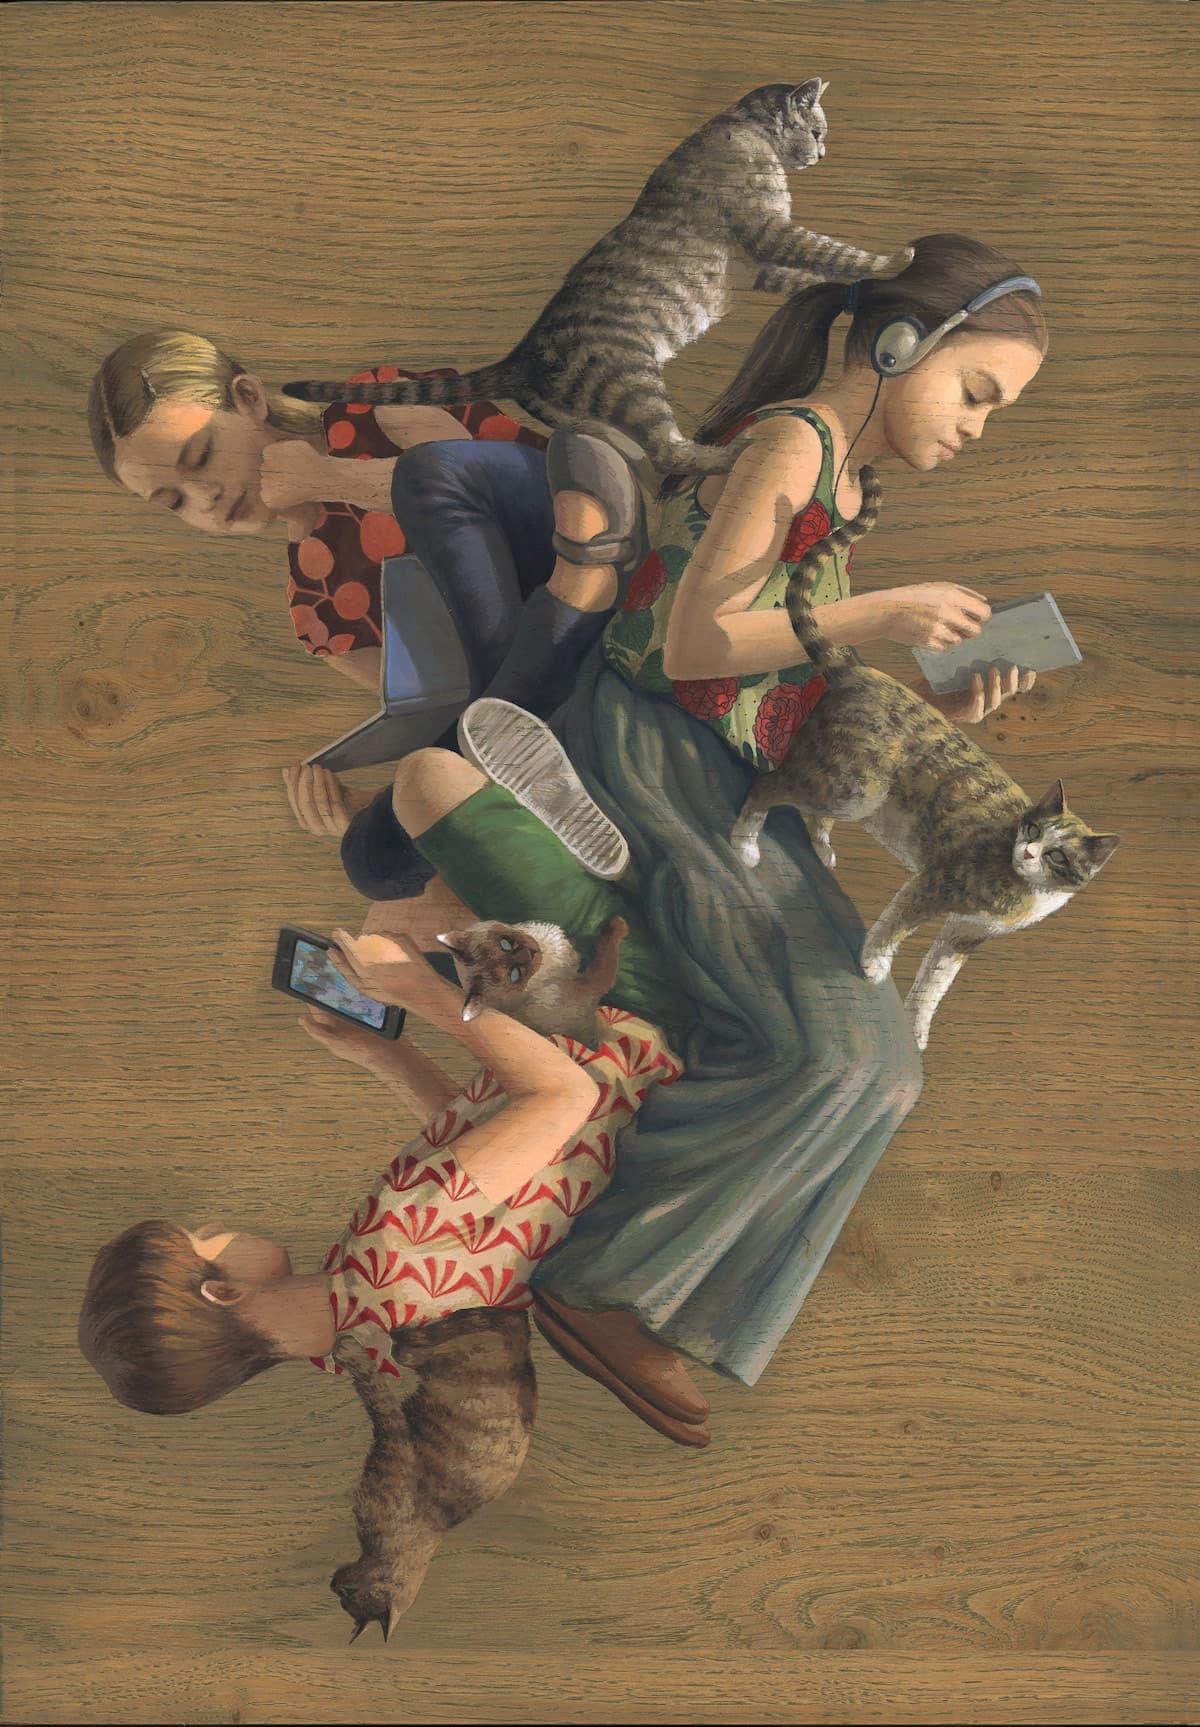 Cinta Vidal - Multi-perspektivische Bilder